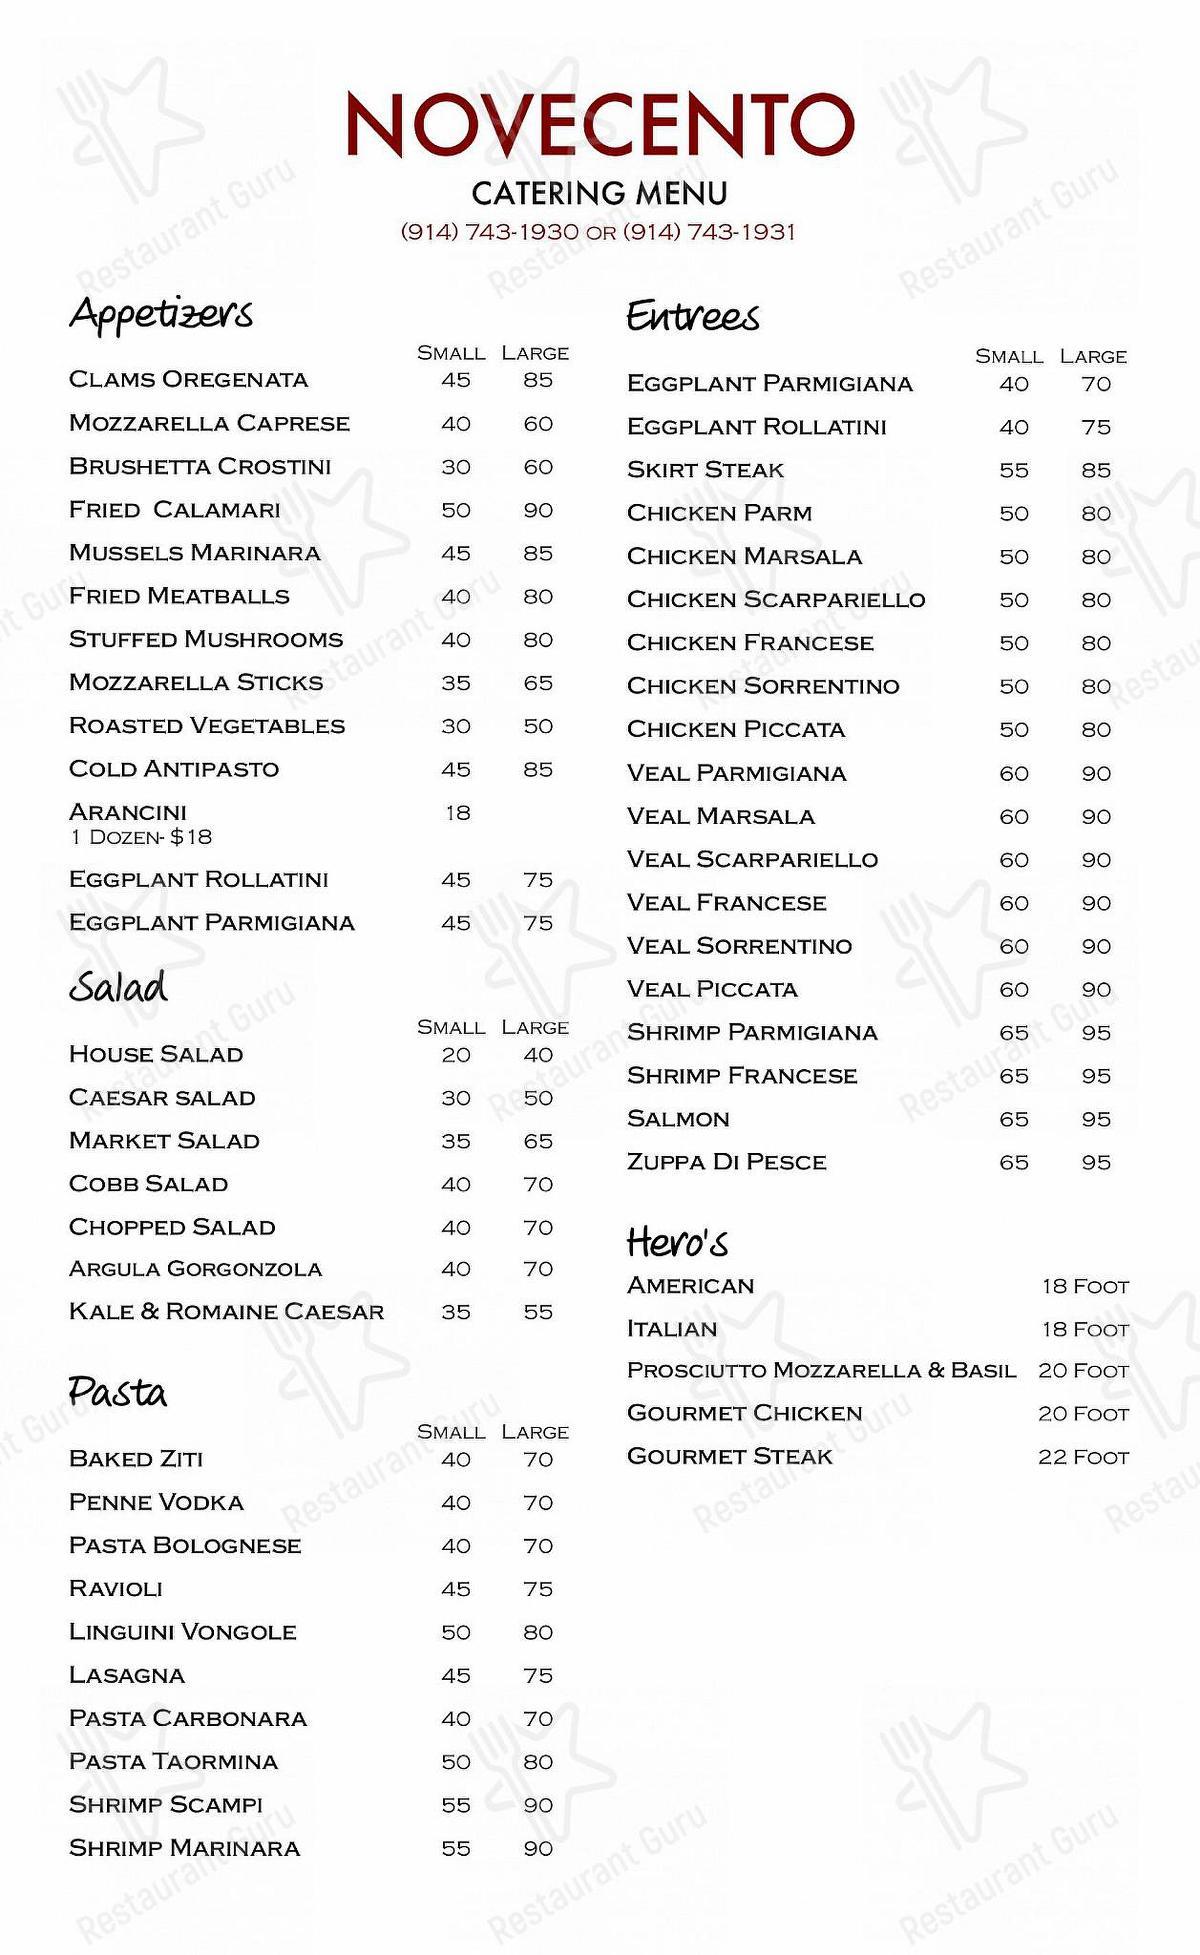 901 Wood Burning Kitchen & Bar menu - meals and drinks